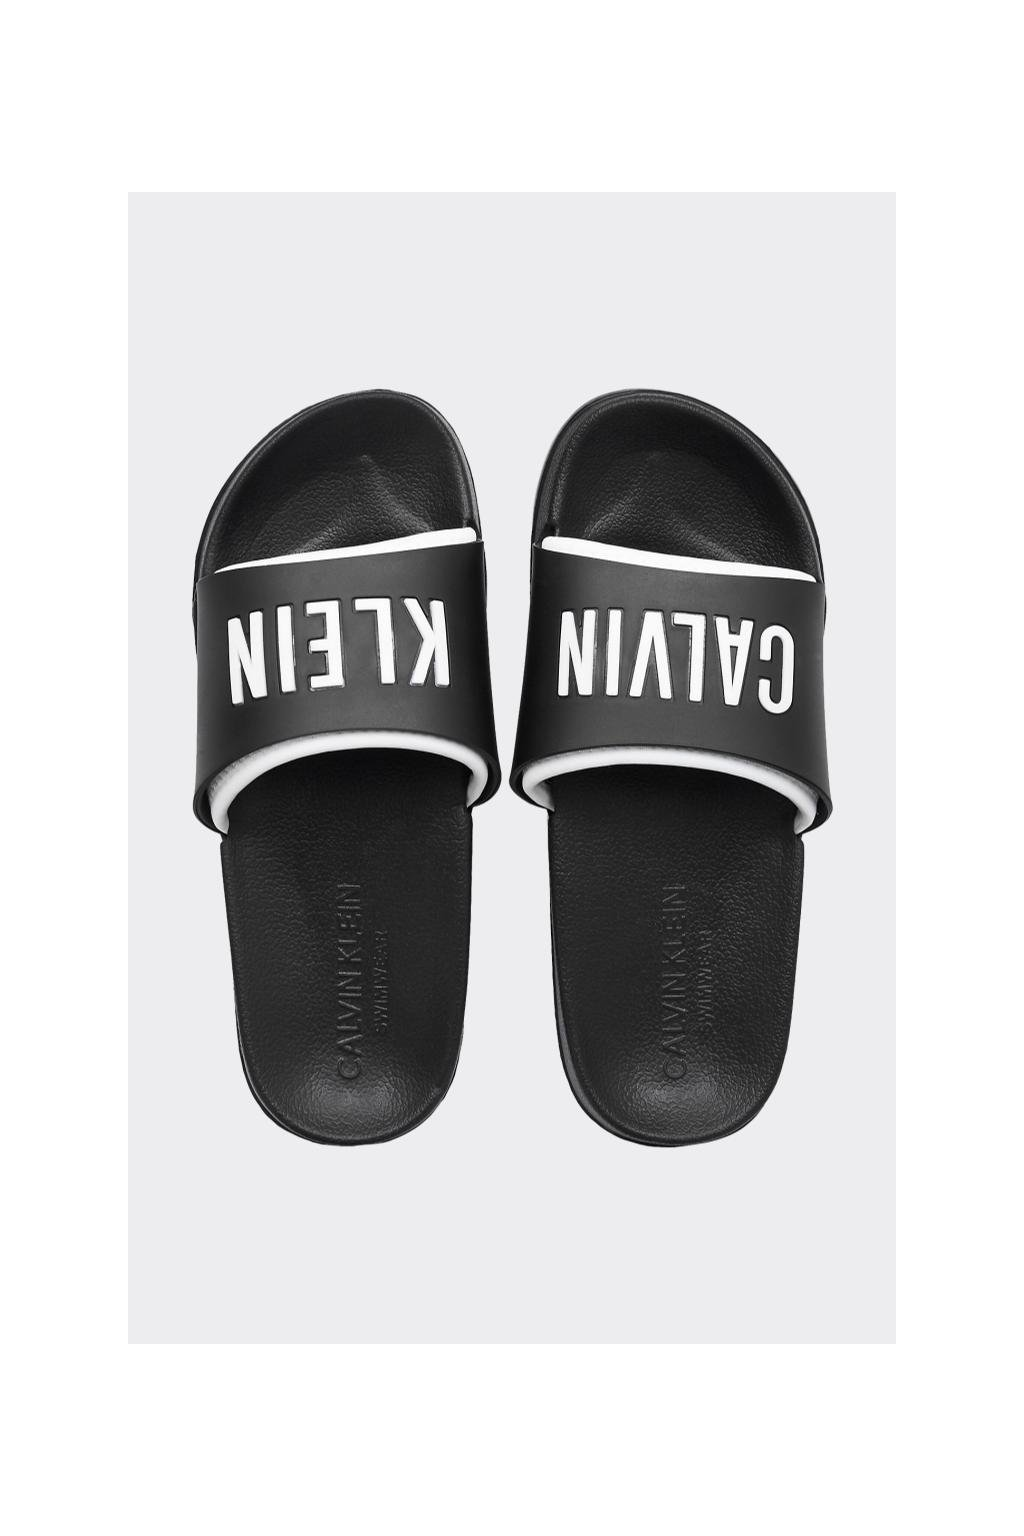 Calvin Klein Intense Power pantofle dámské - černé